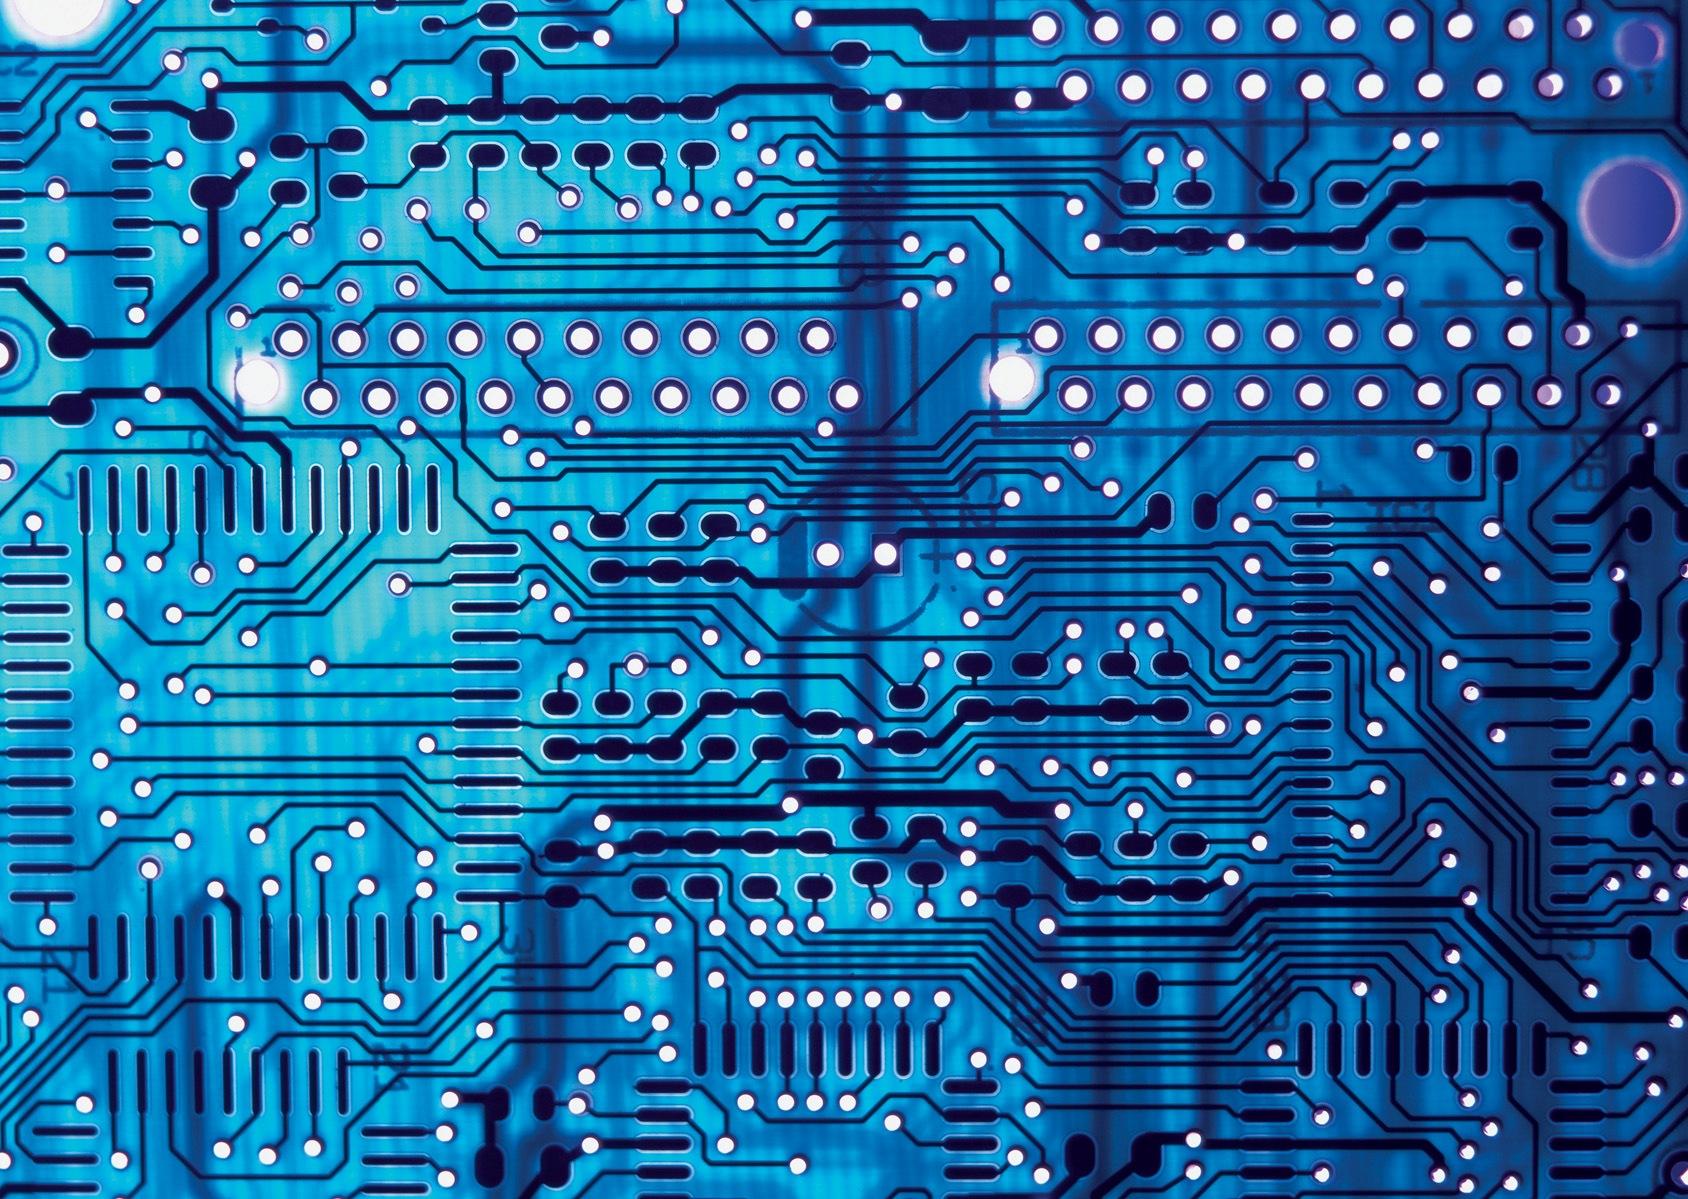 Electronics Micro Wallpaper 1688x1199 Electronics Micro 1688x1199